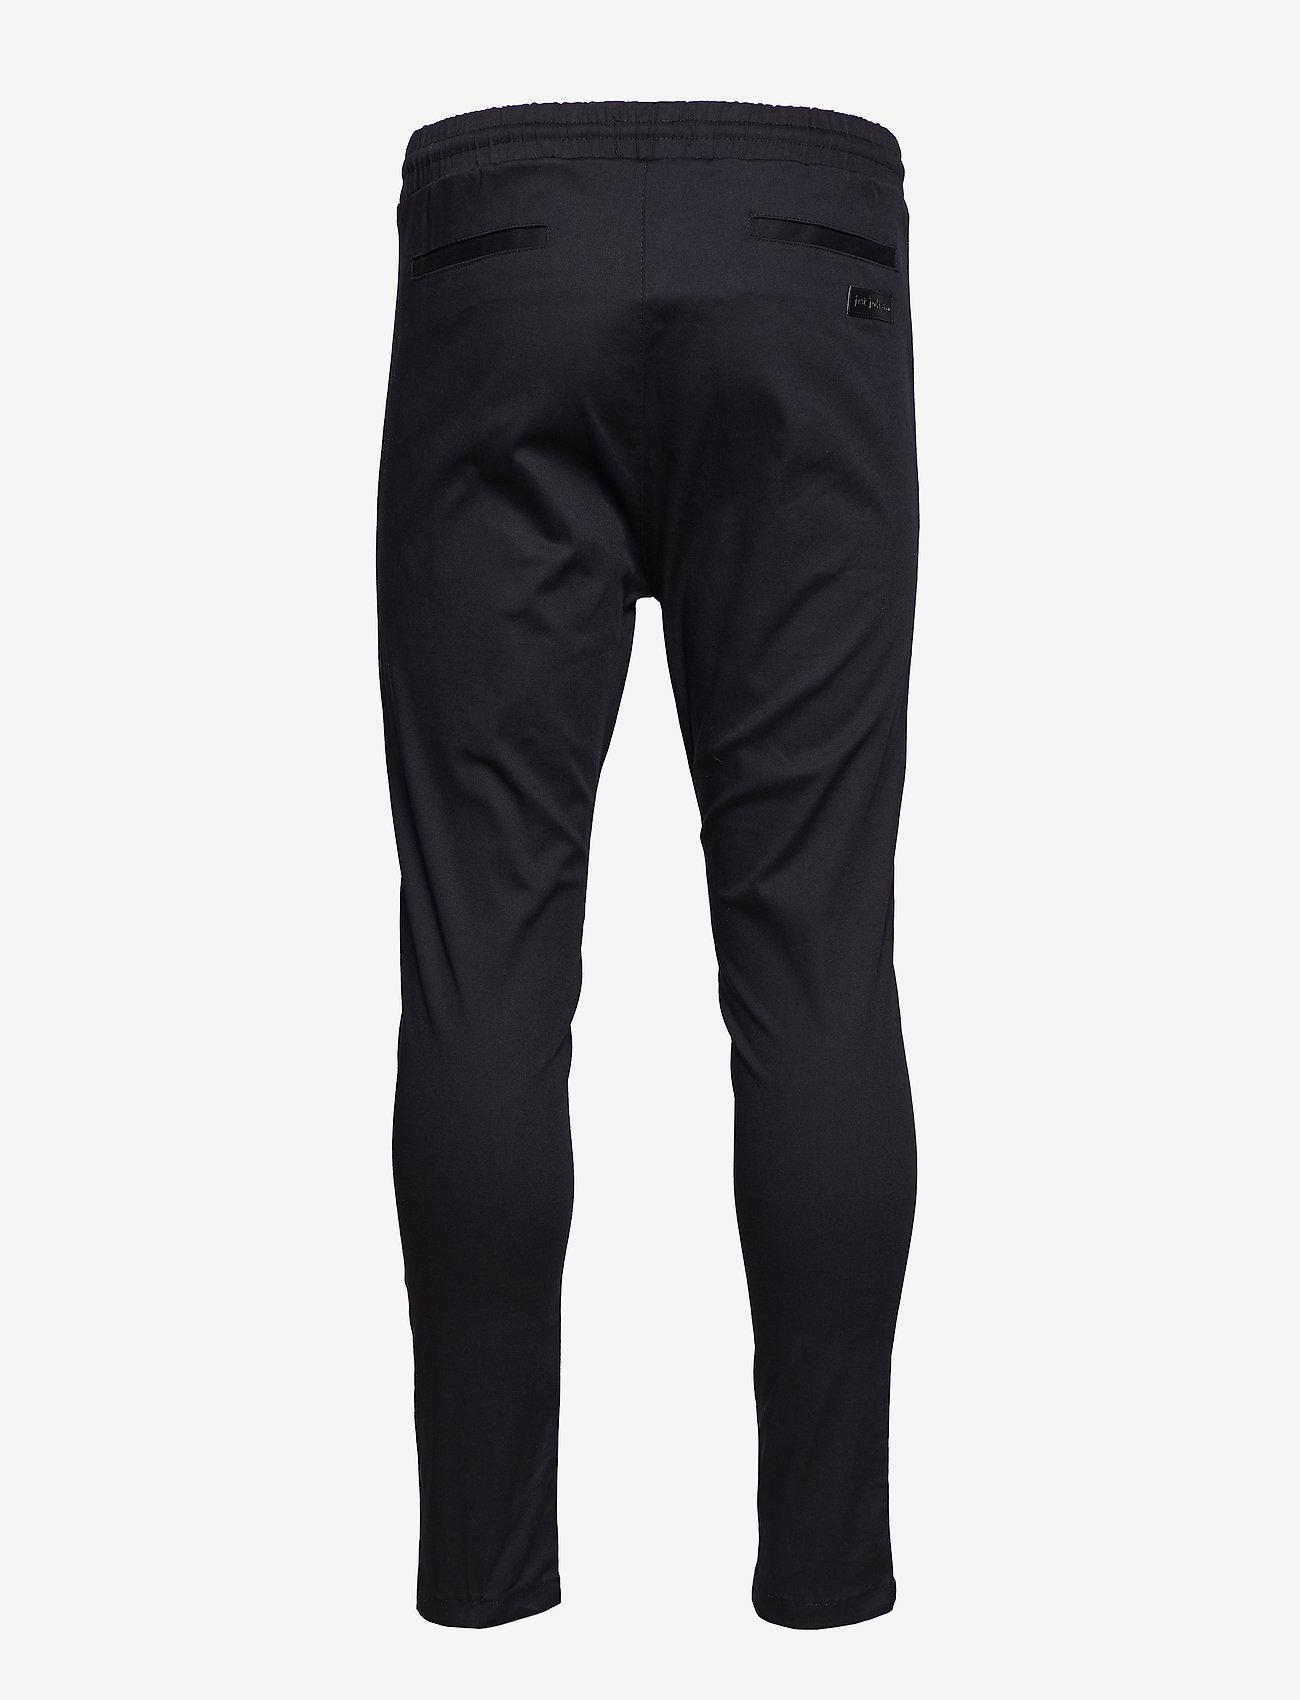 Just Junkies - Flex 2.0 - spodnie na co dzień - black - 1